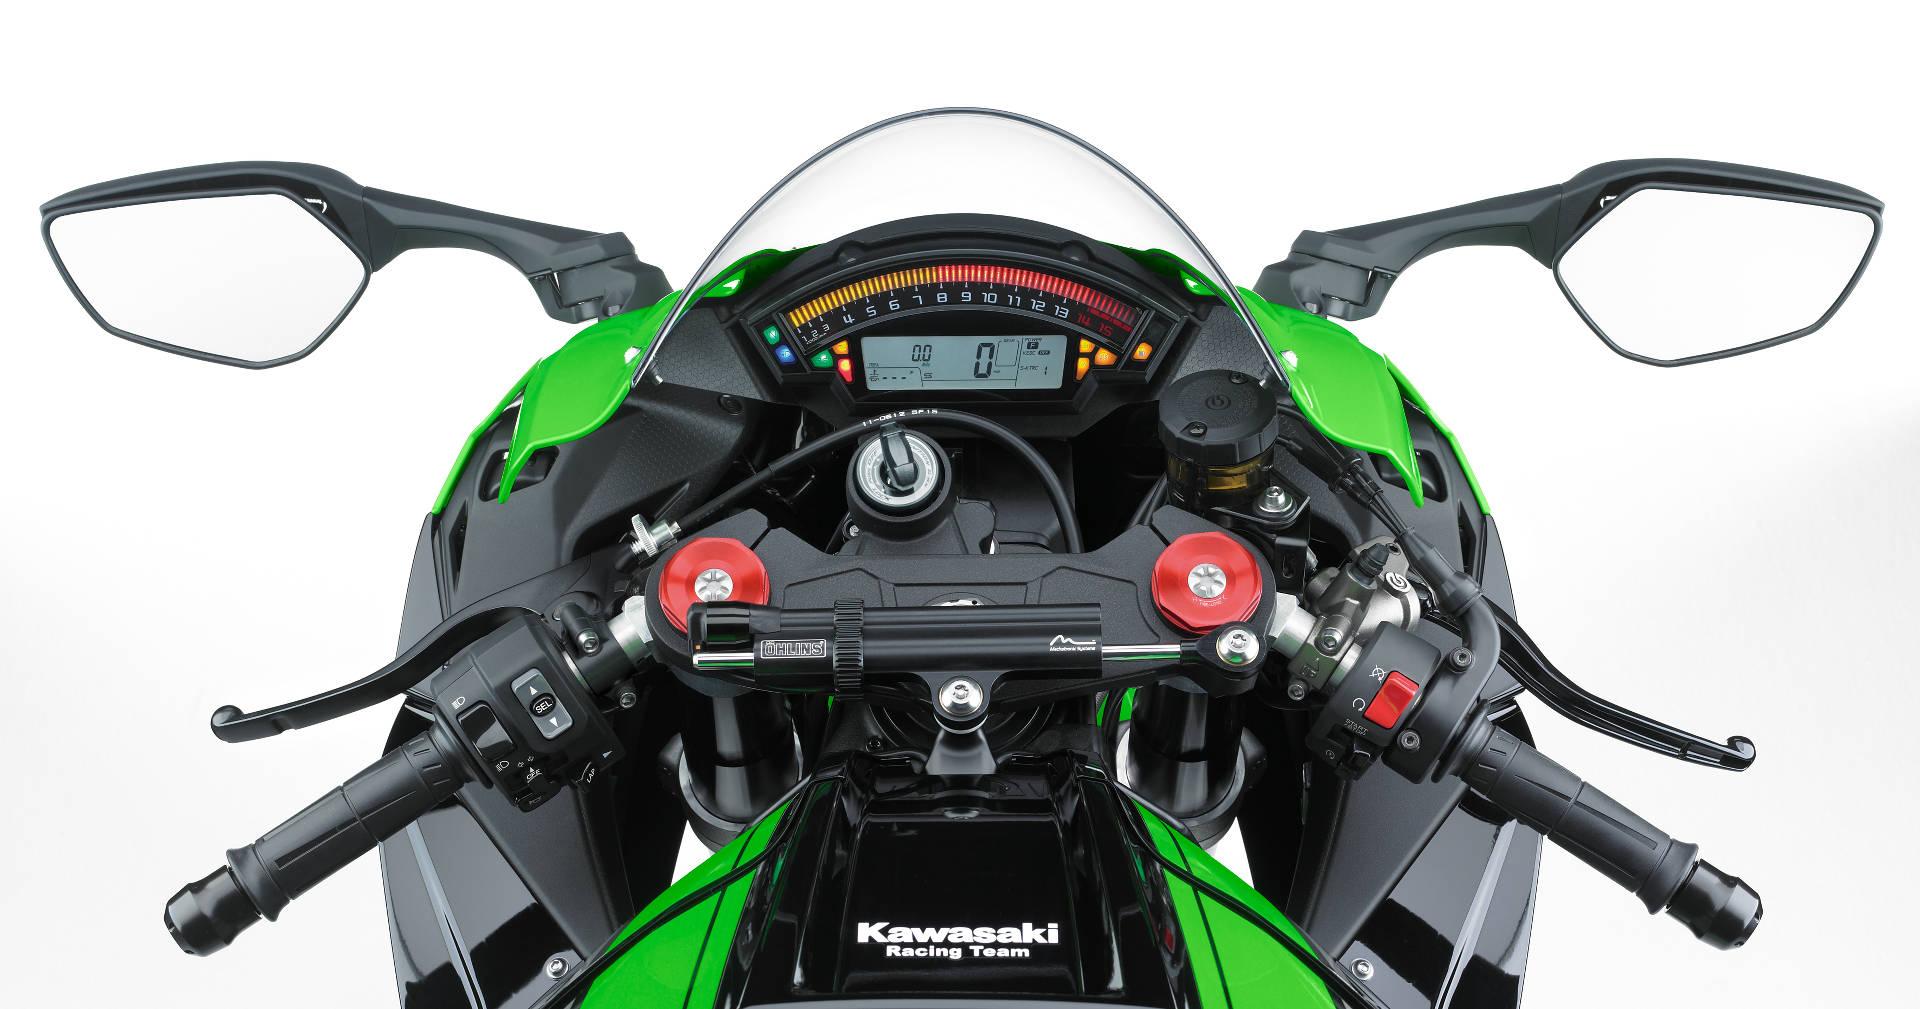 Kawasaki Ninja ZX-10R 2016 - tableau de bord / dashboard